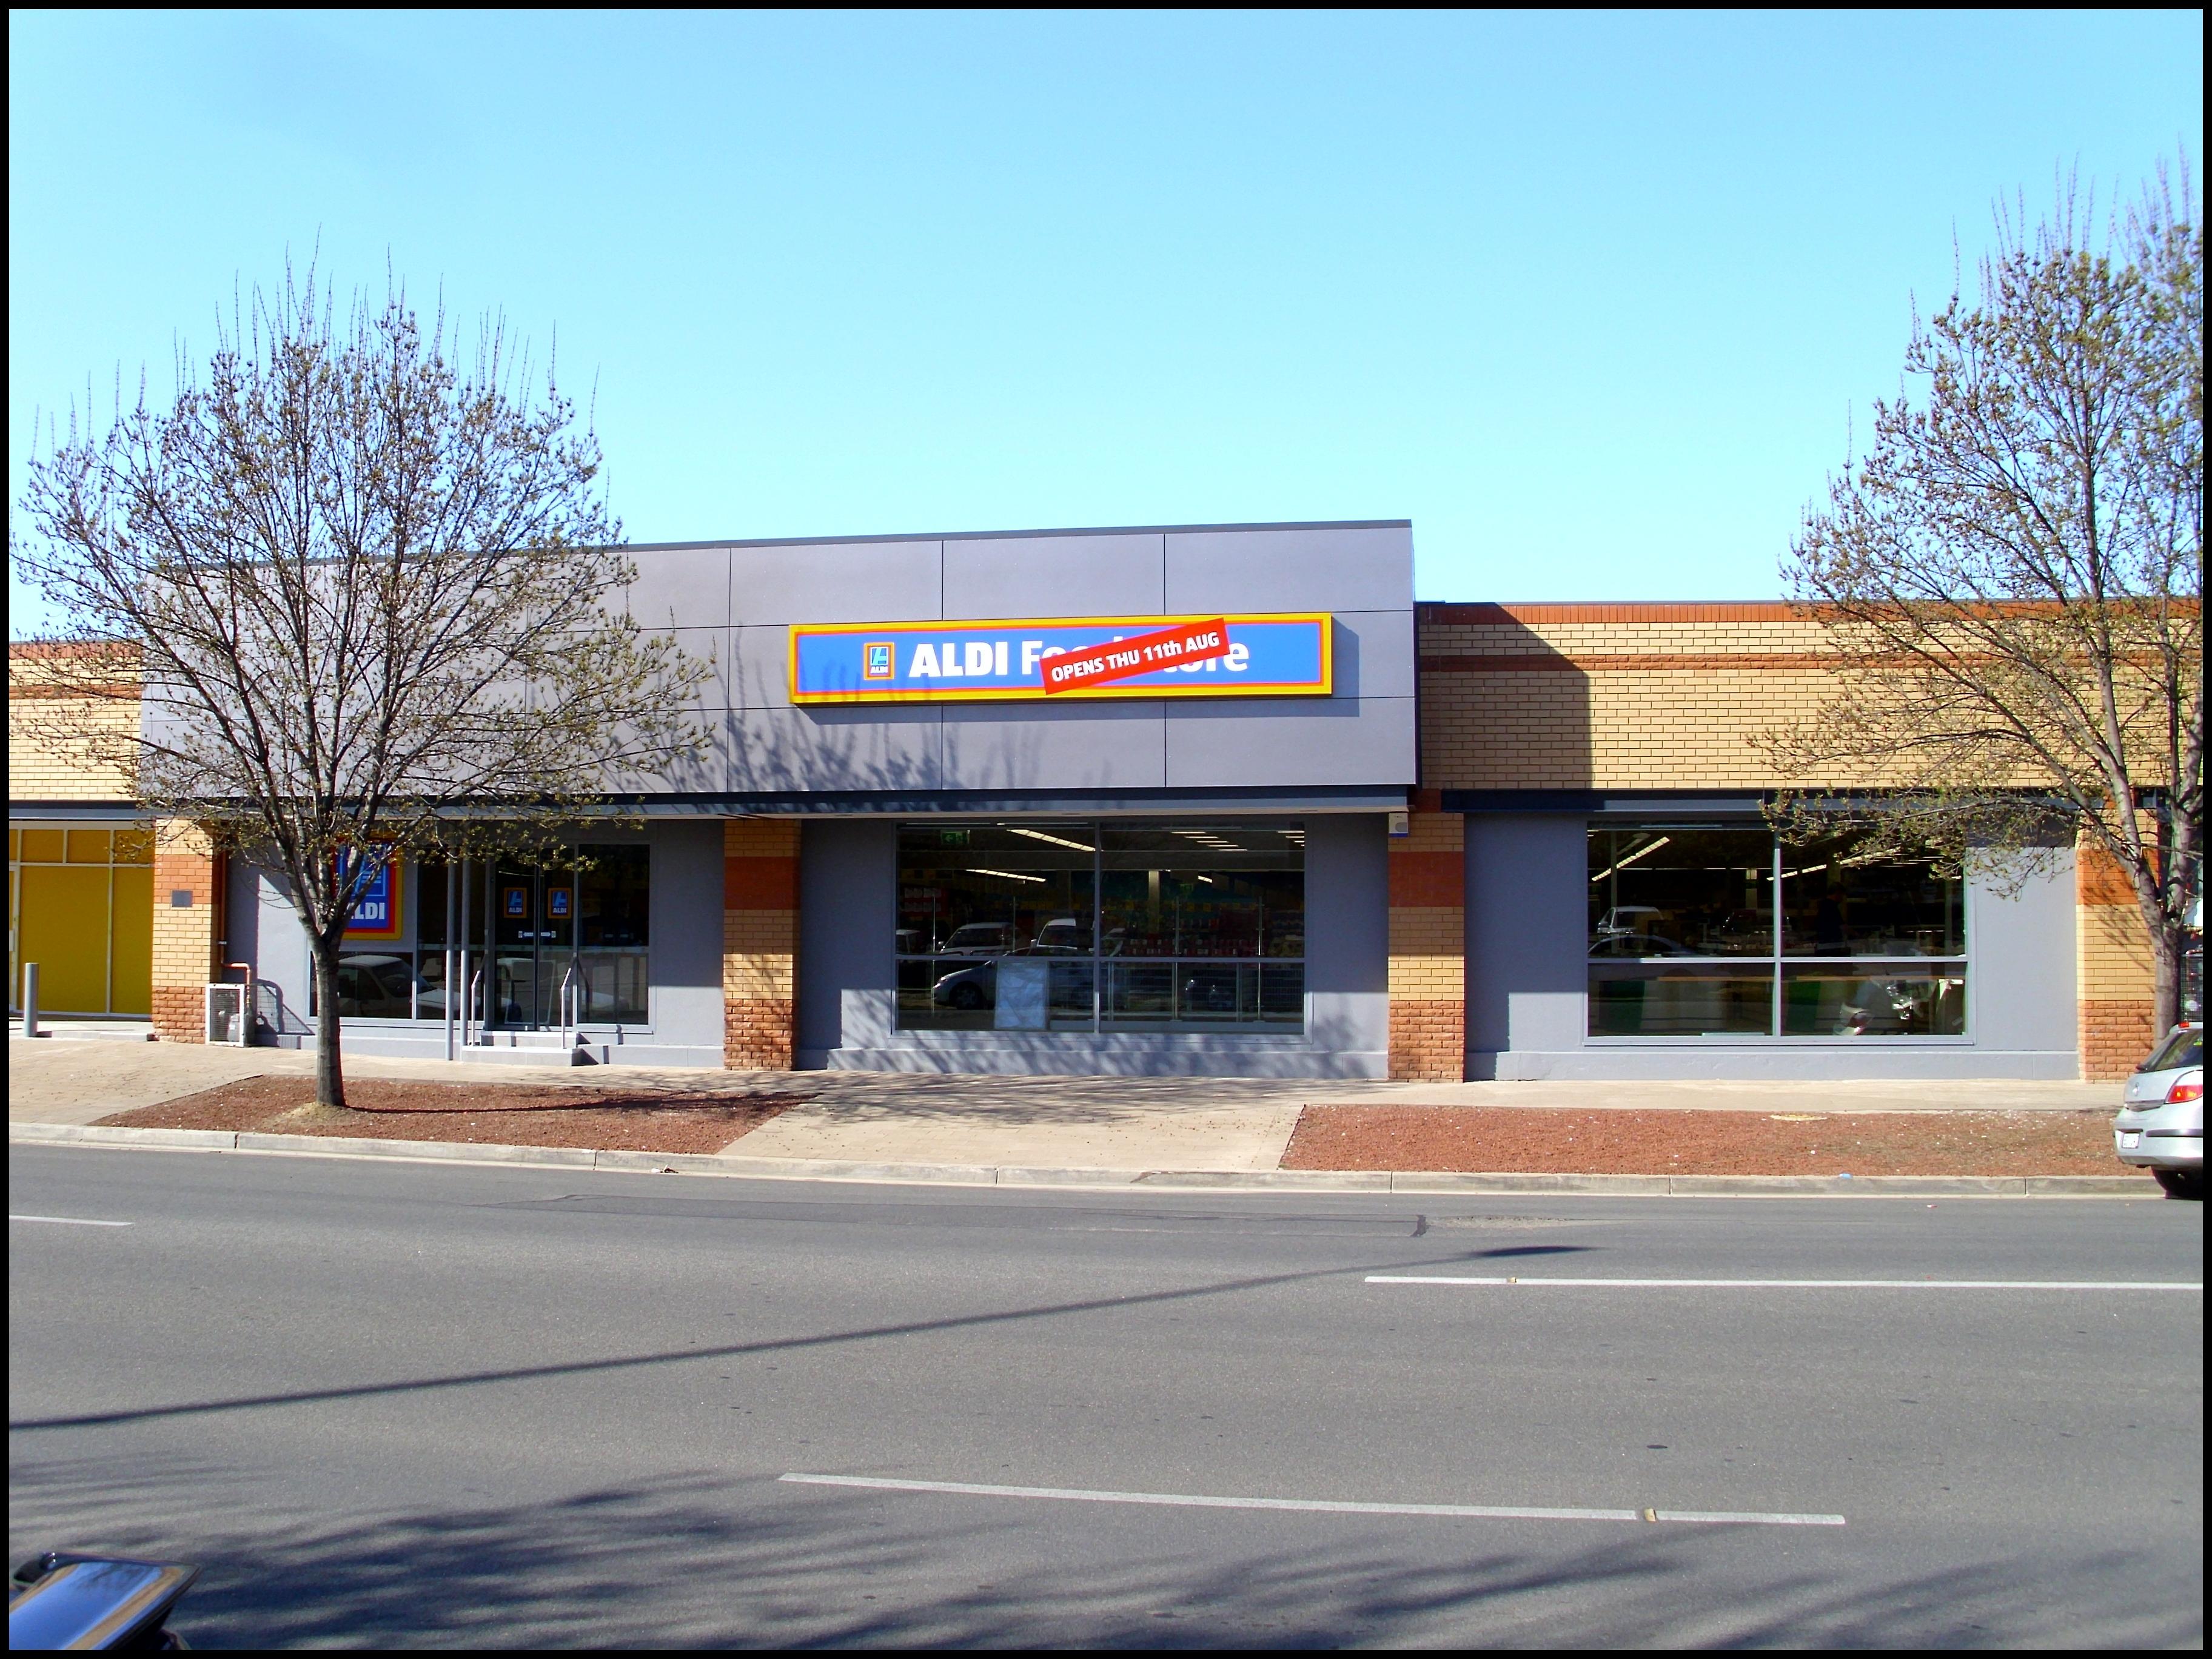 File Aldi Food Store at the Riverina Plaza in Wagga Wagga